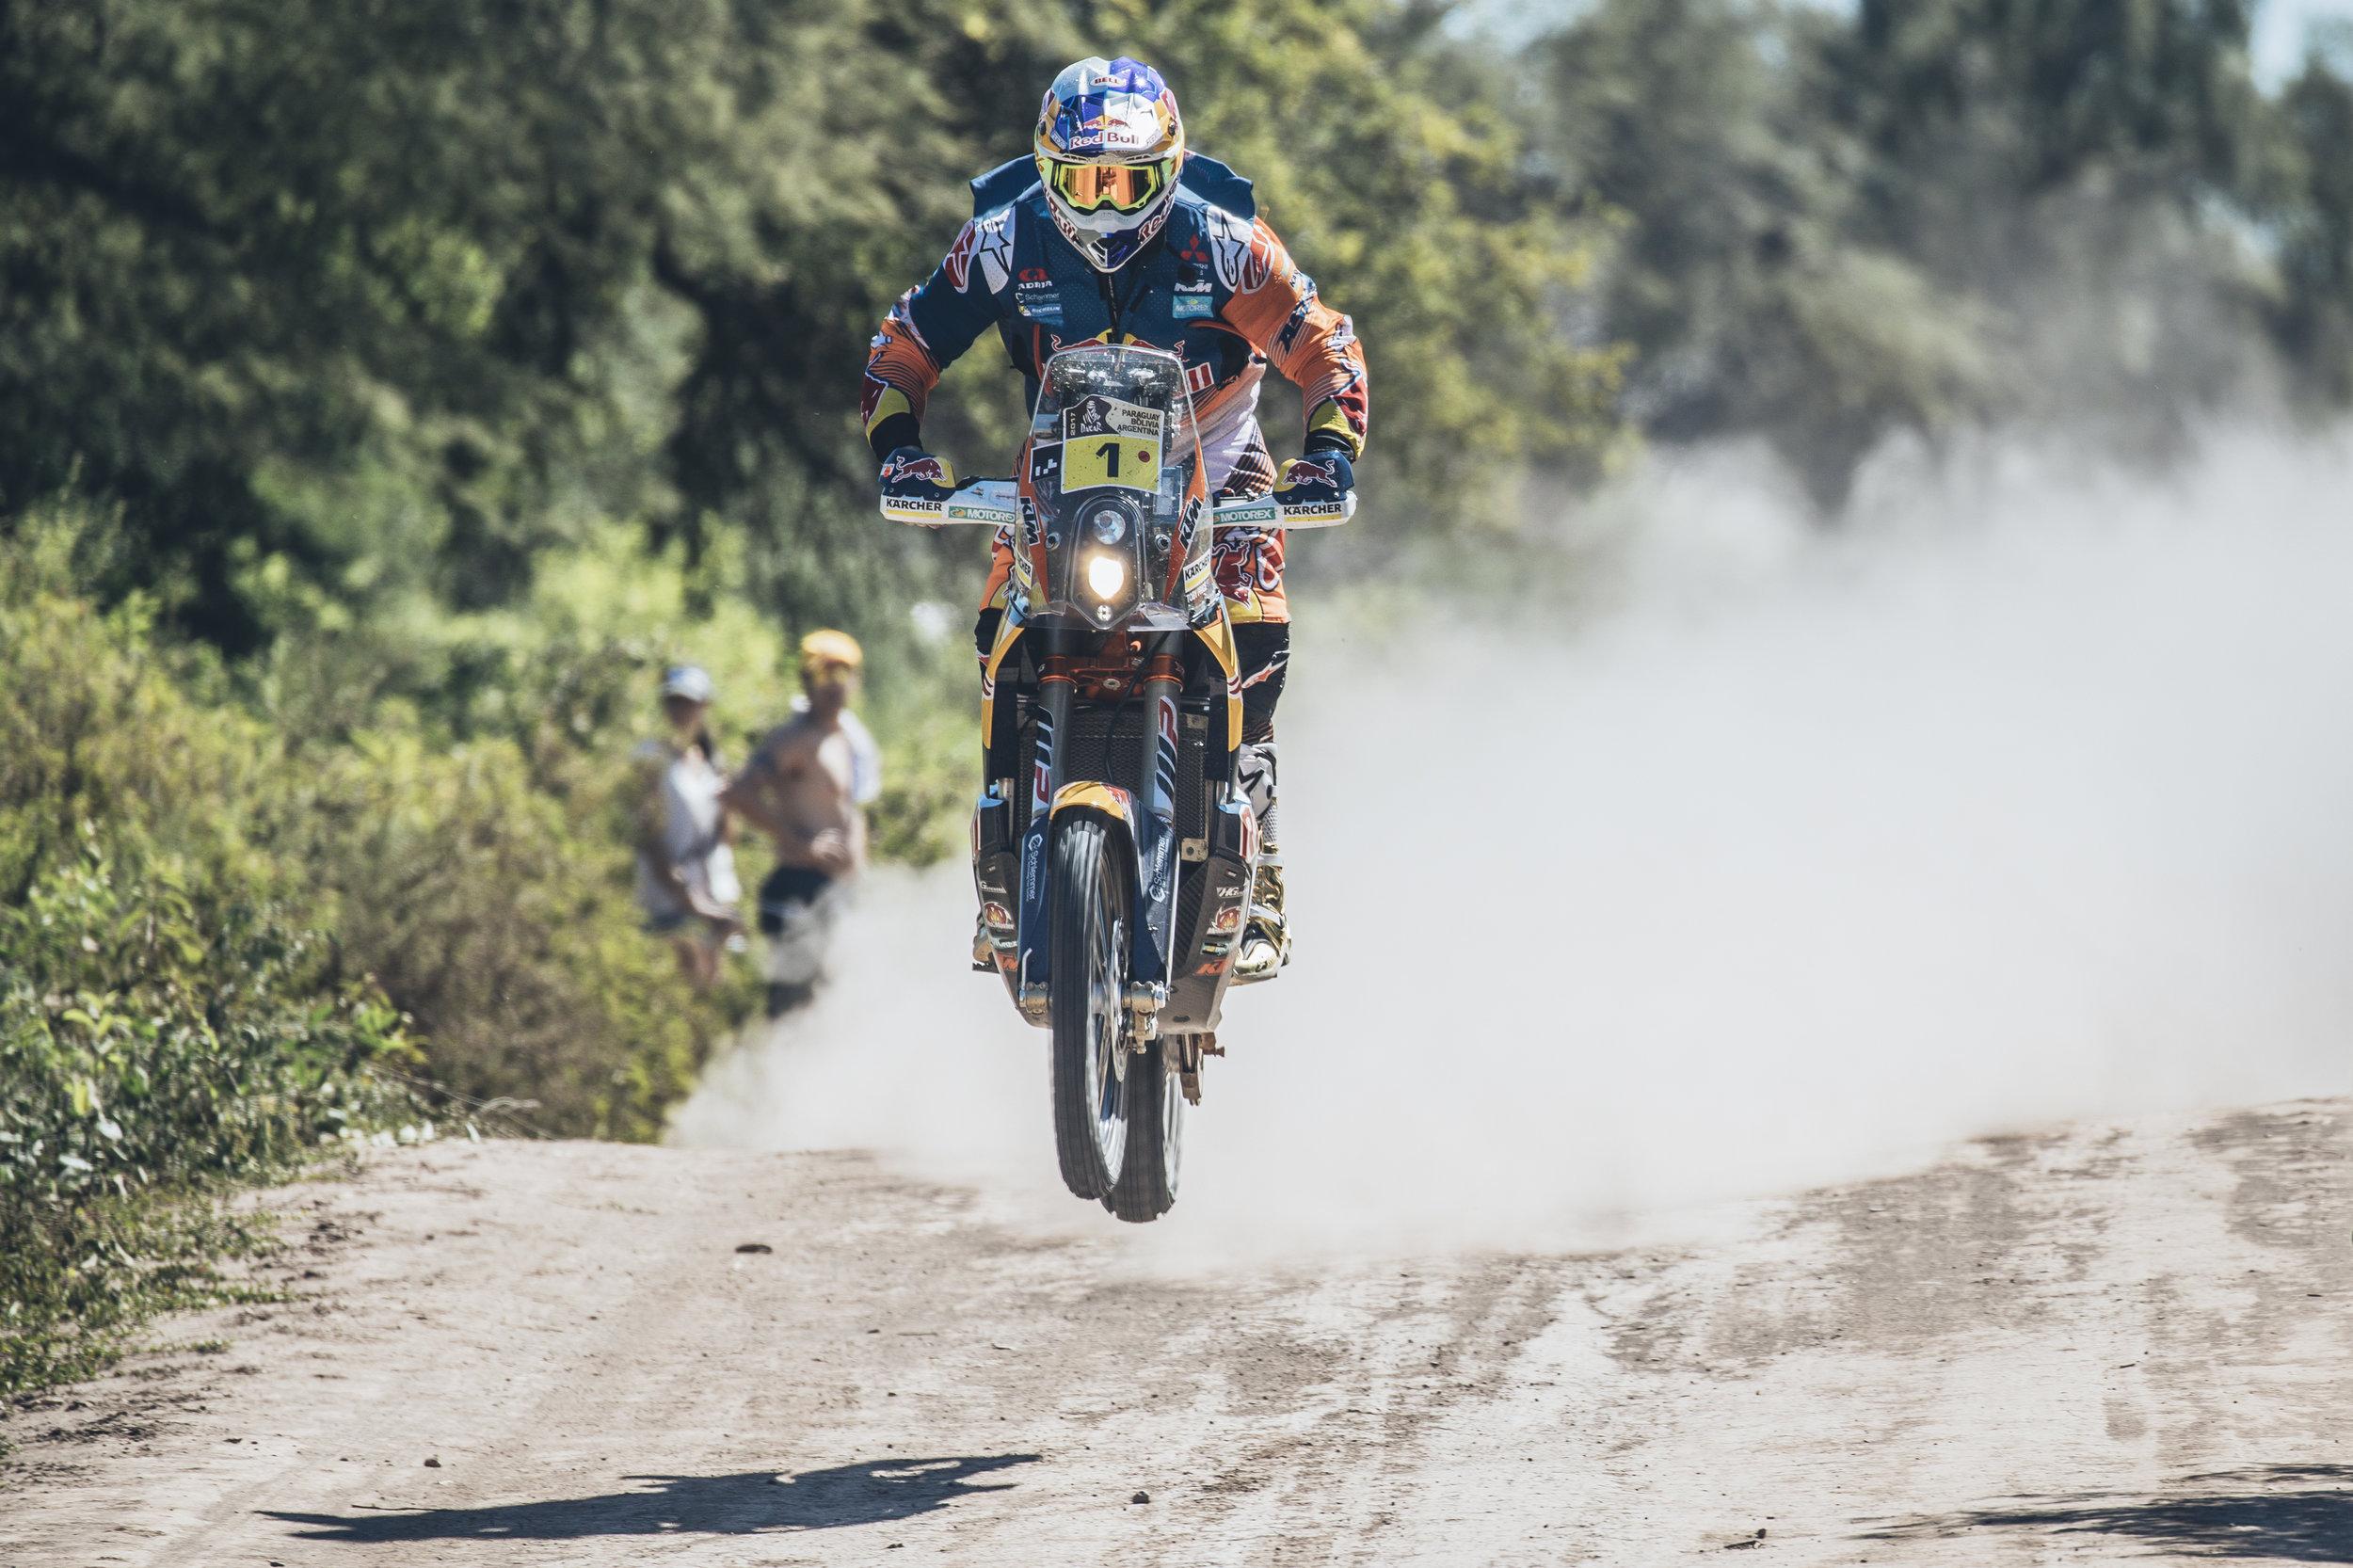 Toby Price KTM 450 RALLY Dakar 2017.jpg